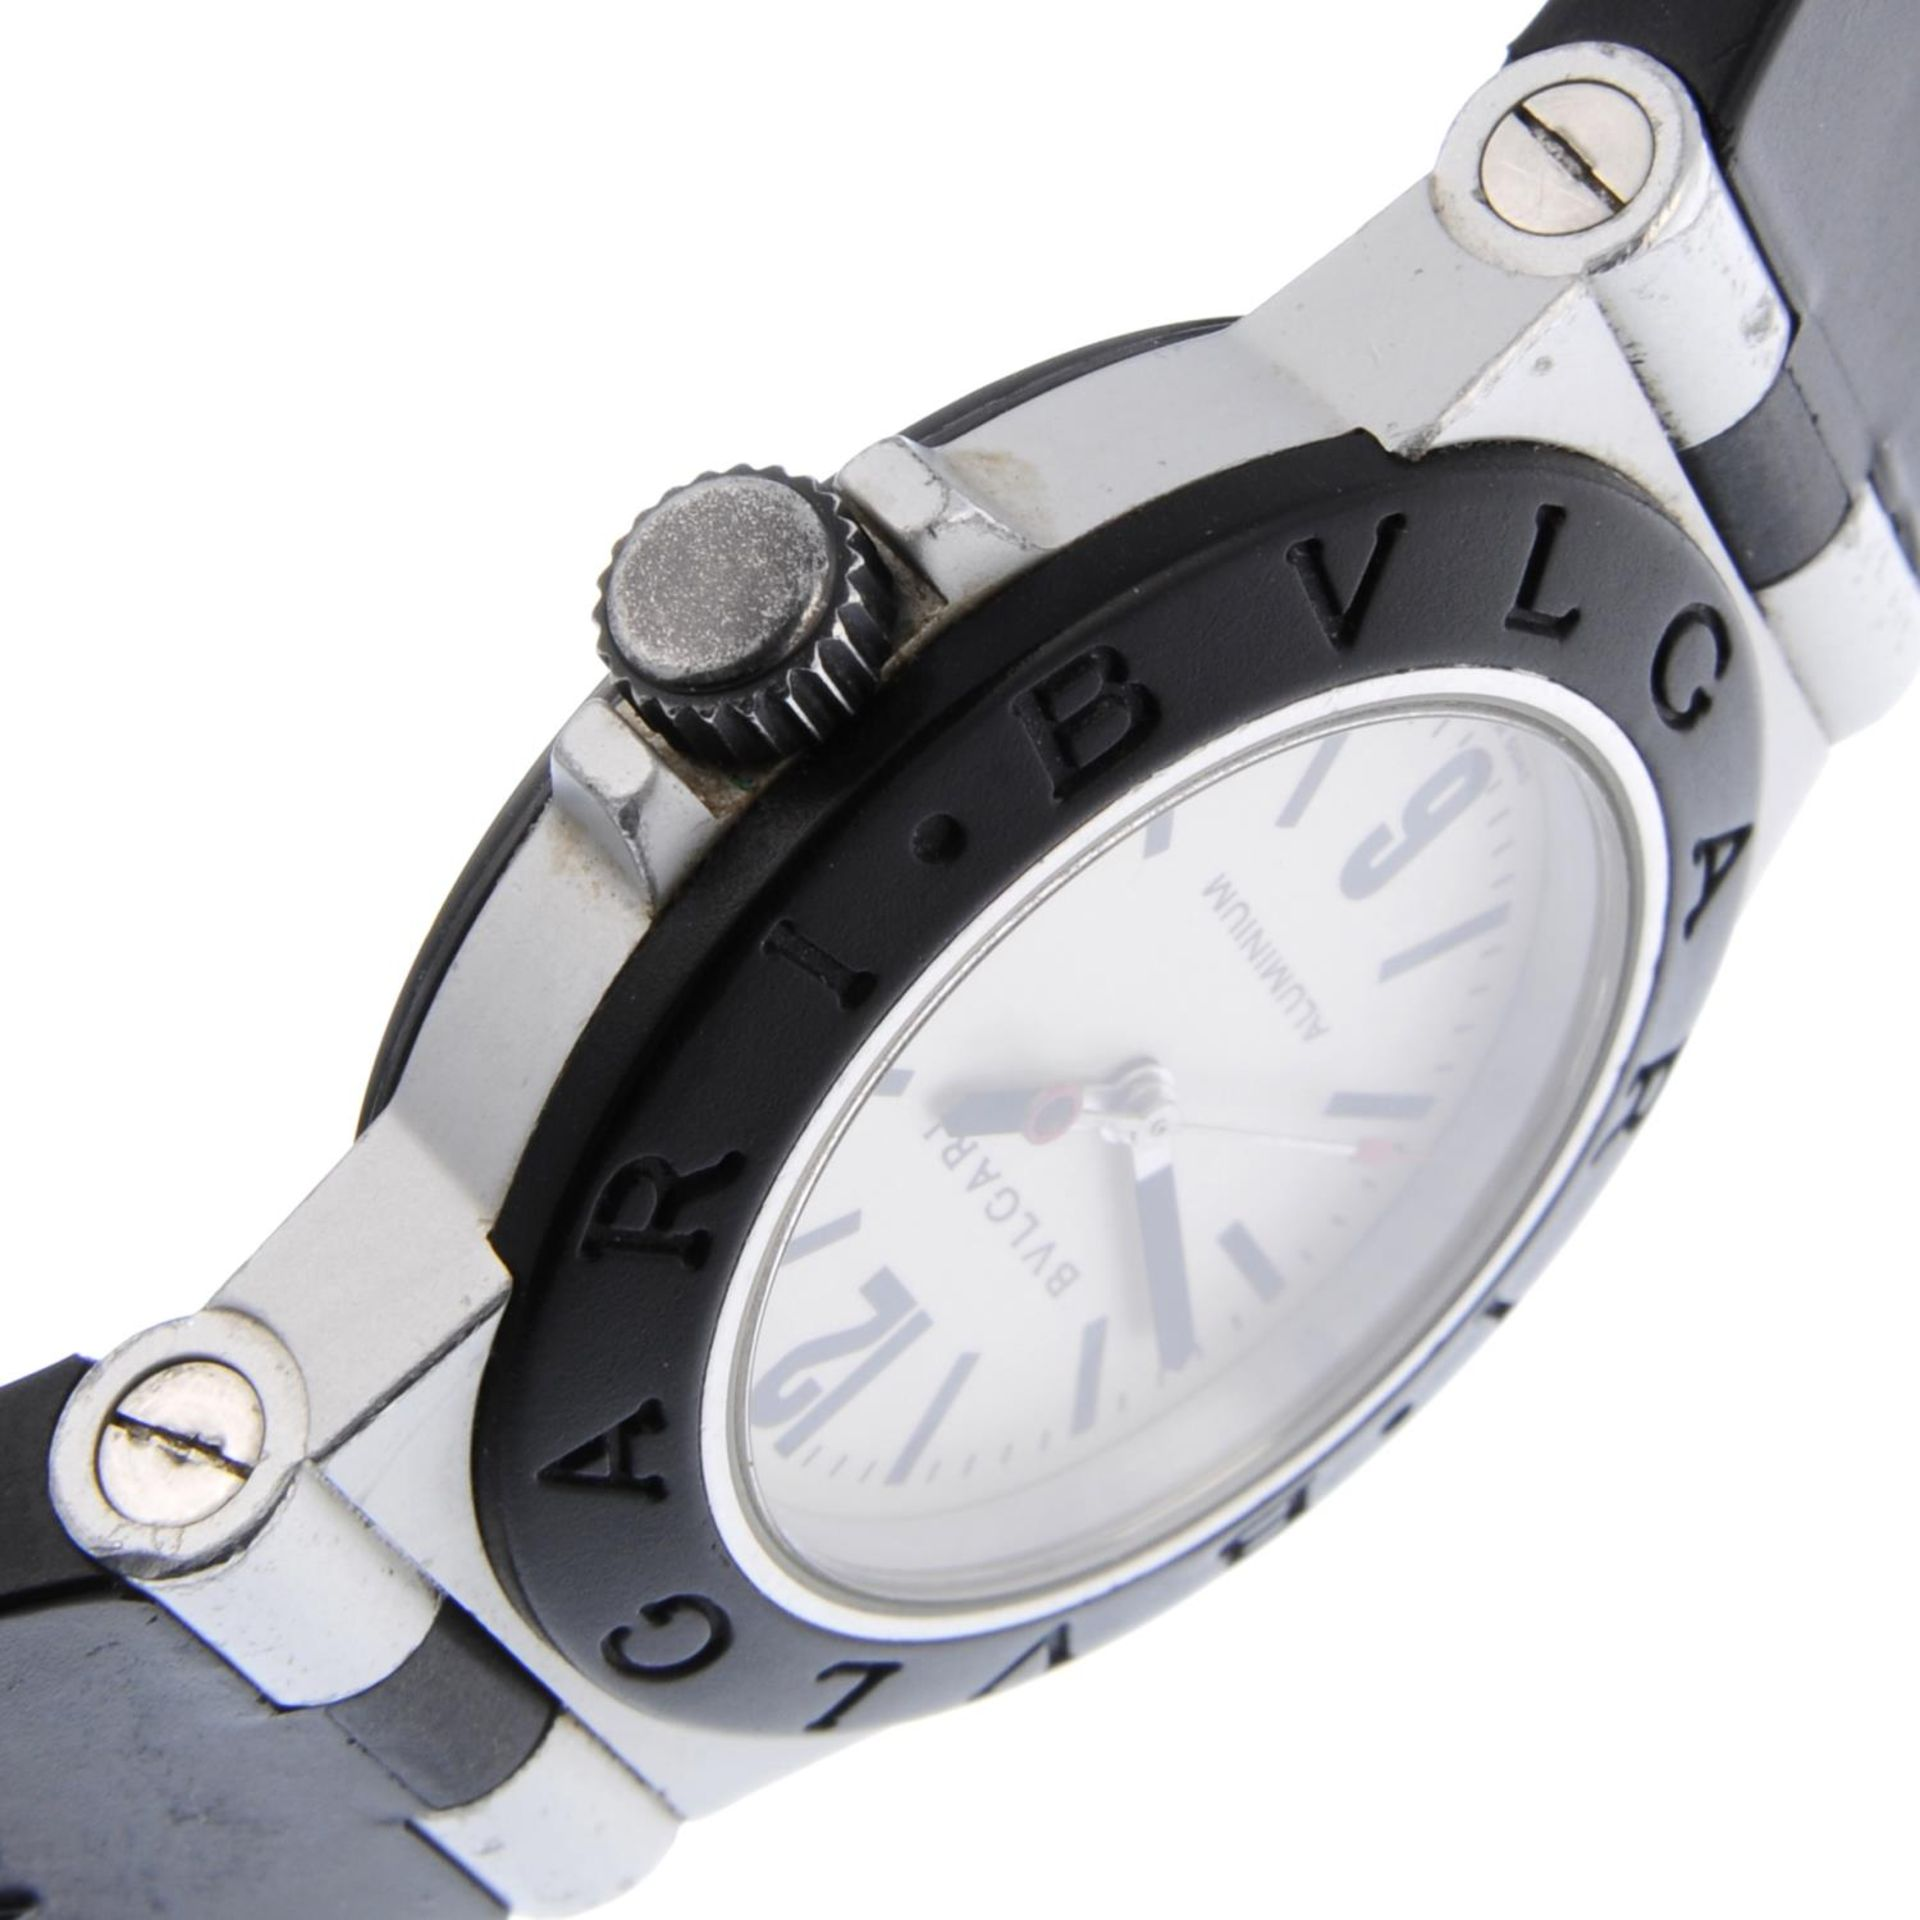 Los 10 - BULGARI - a mid-size Diagono Aluminium wrist watch.